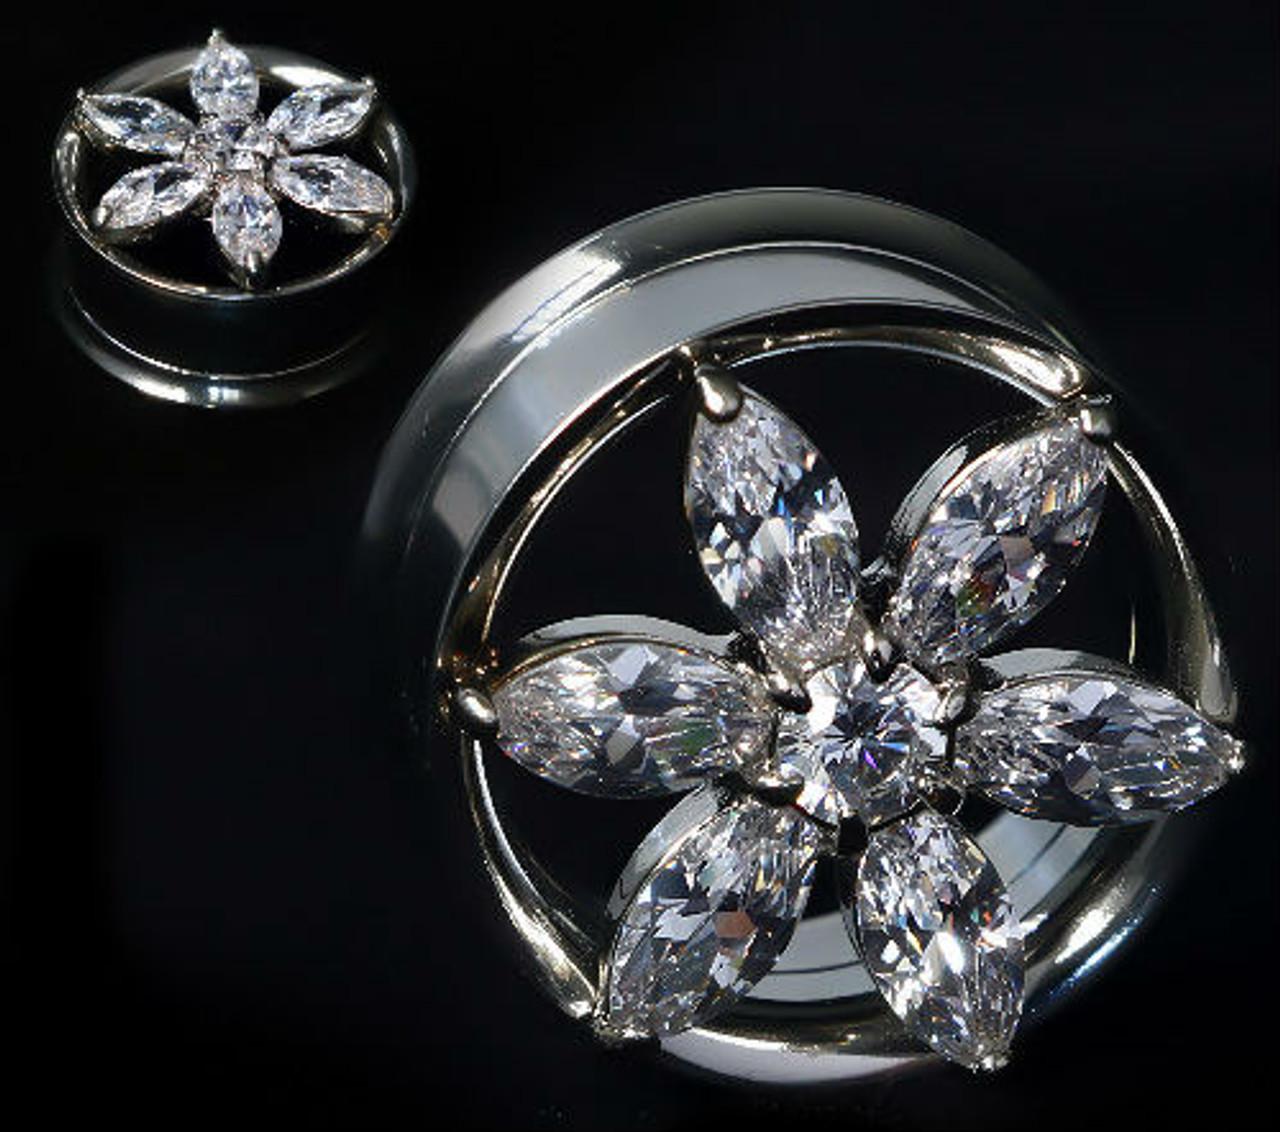 Pair Organic Semi Precious Stone Saddle Ear Gauges Plugs Large Sizes 22mm-35mm